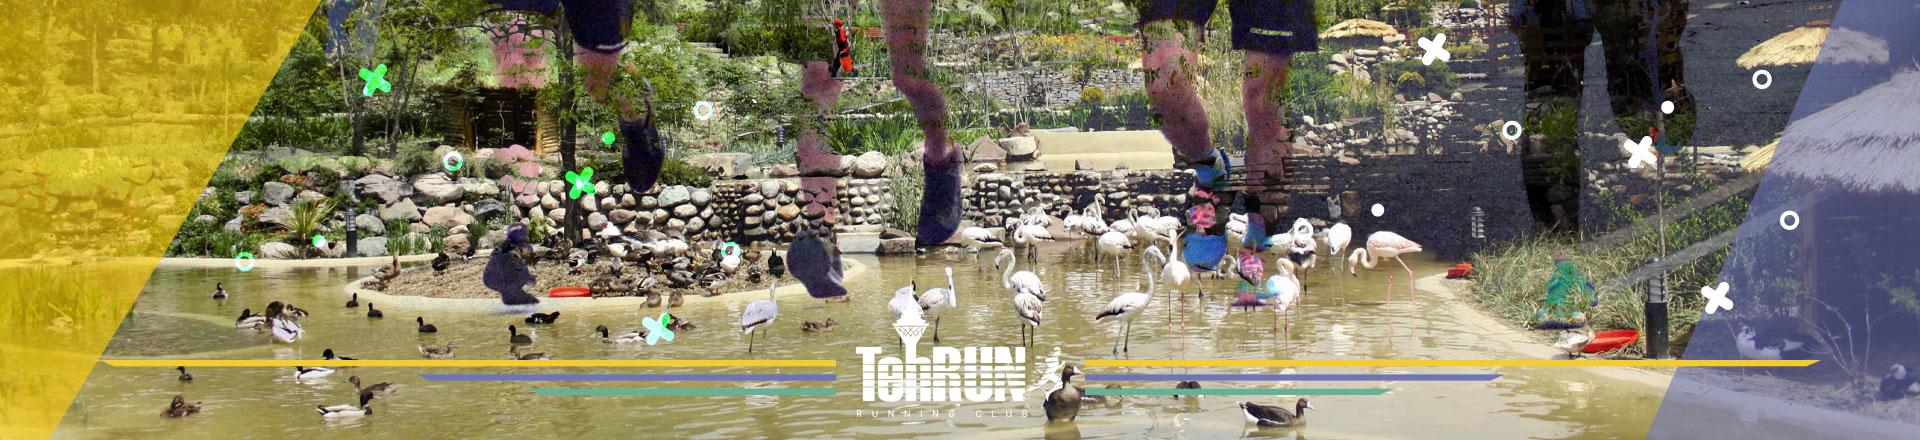 باغ پرندگان لویزان